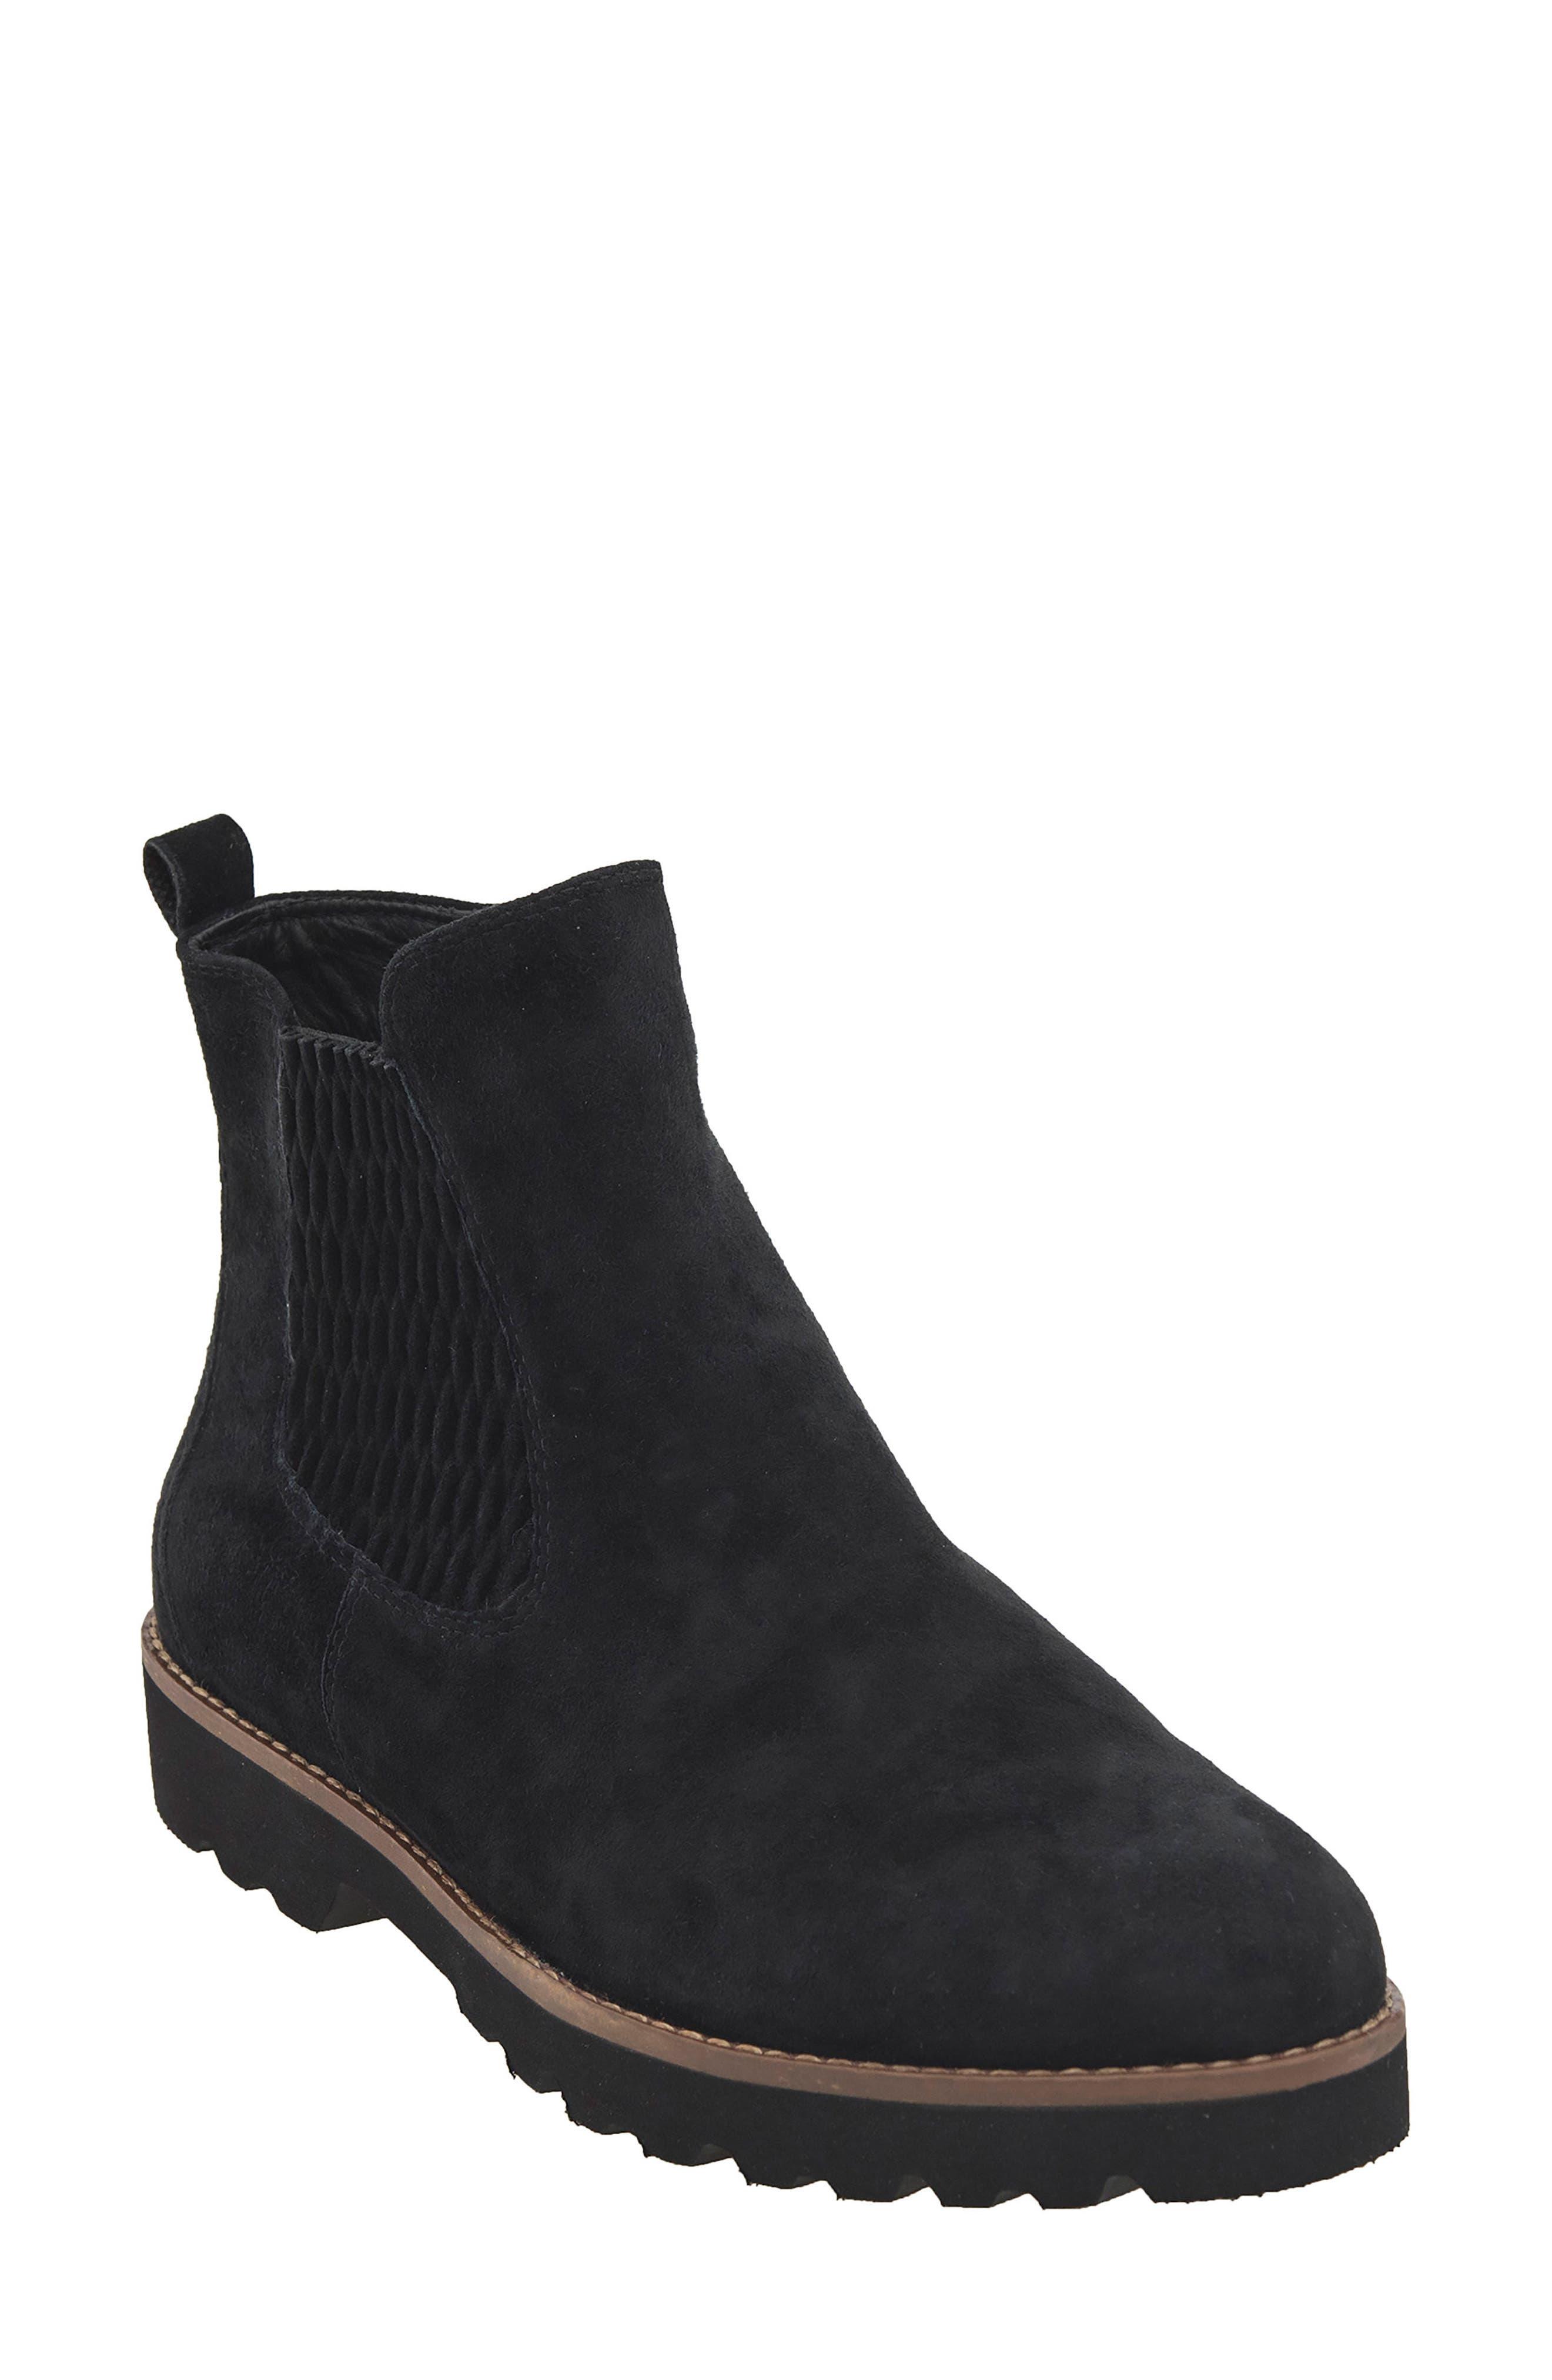 Alternate Image 1 Selected - Earthies® Madrid Chelsea Boot (Women)